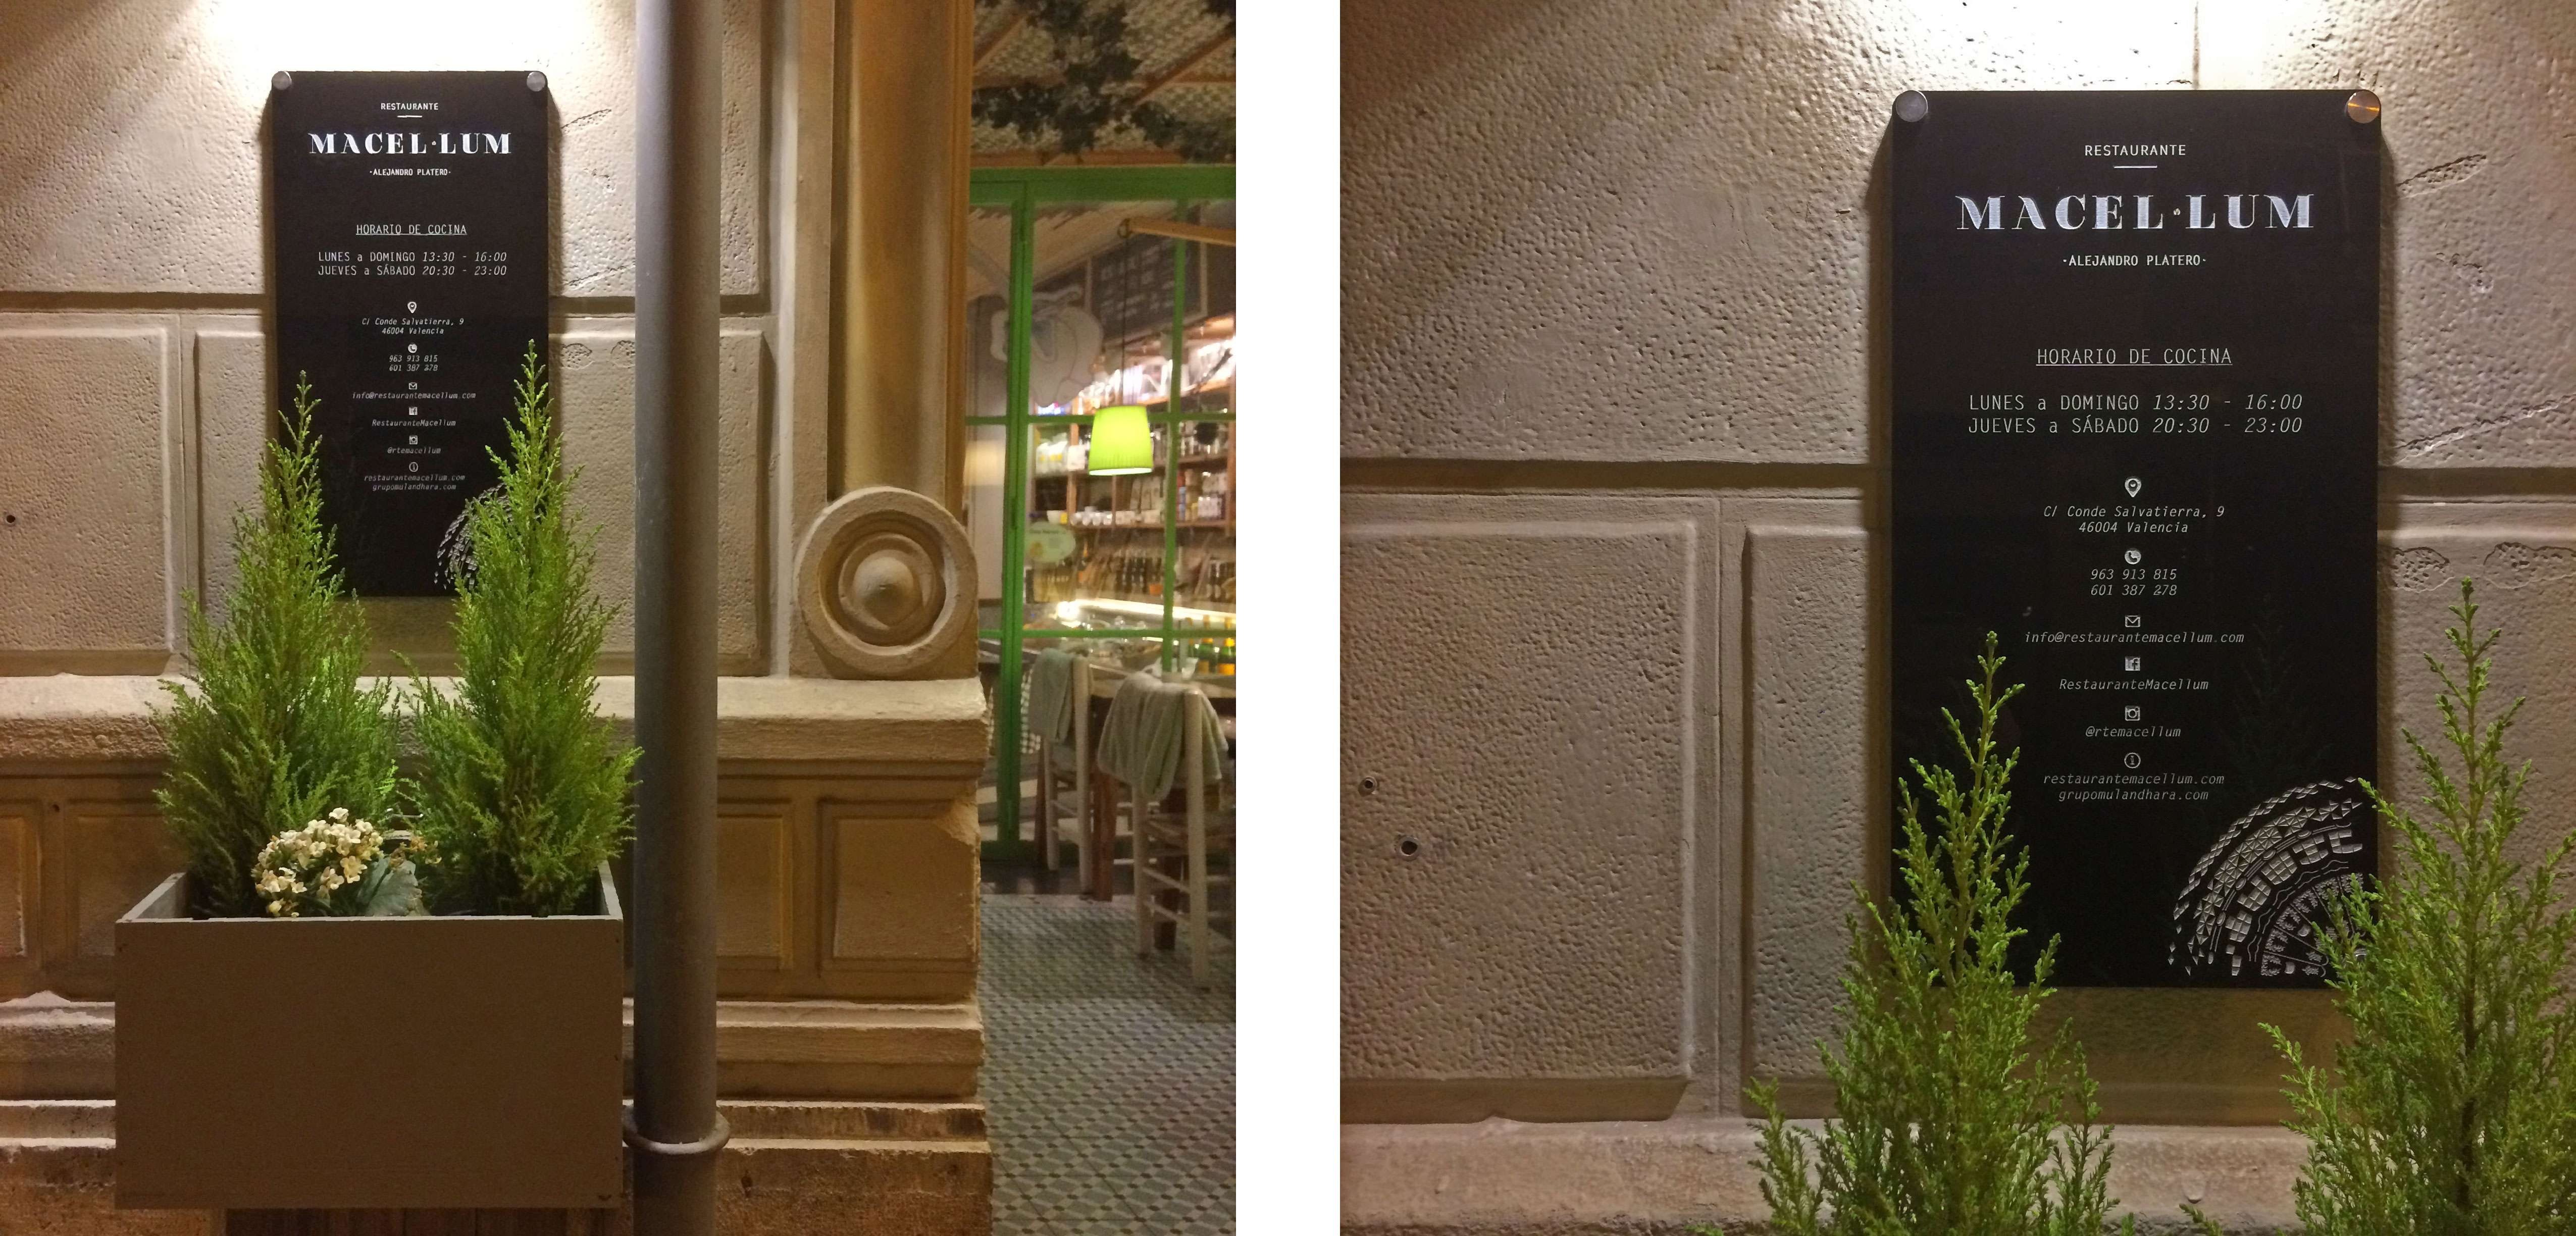 Archicercle - Macel·lum restaurant